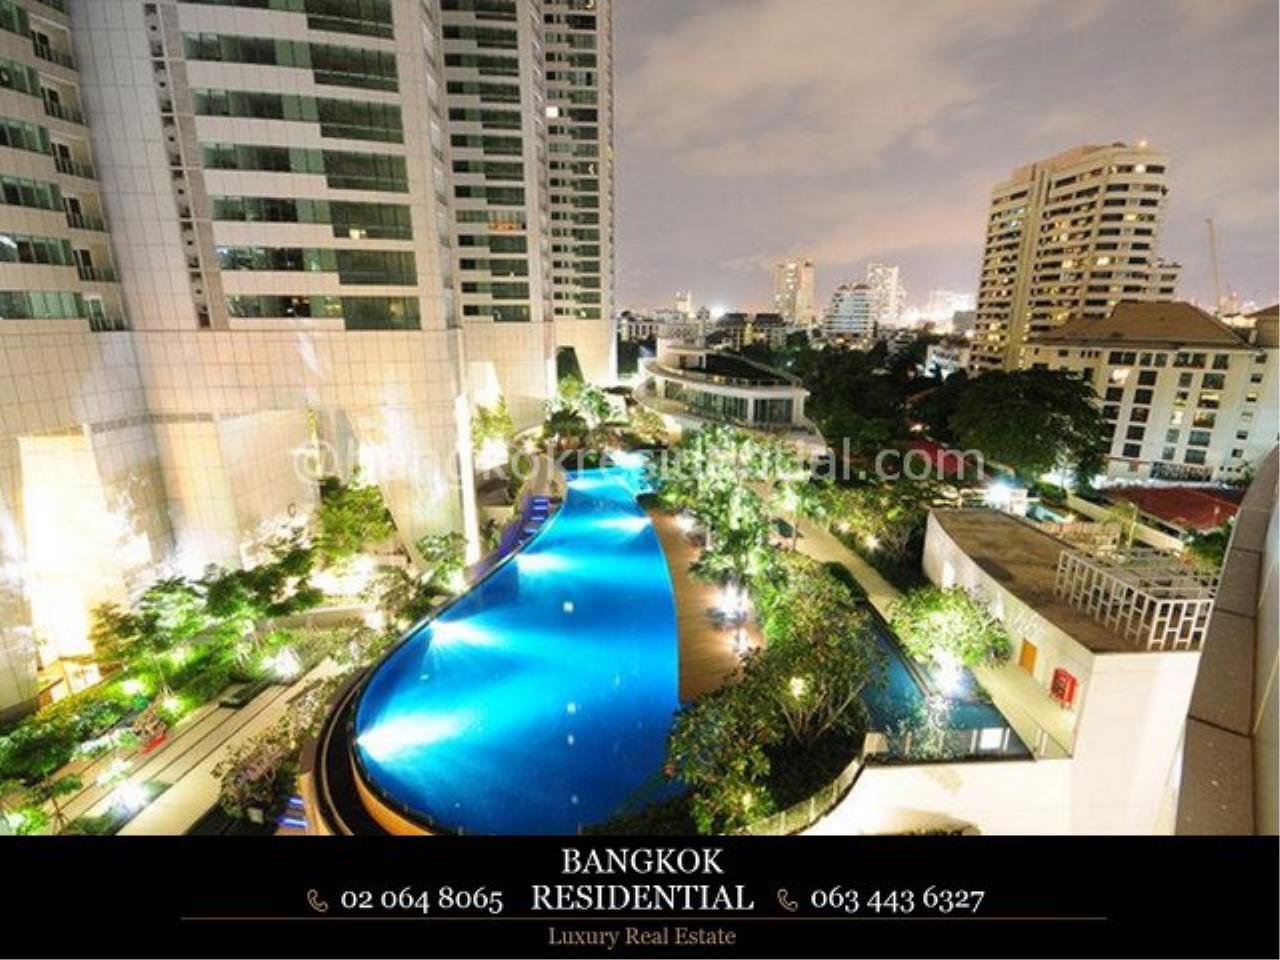 Bangkok Residential Agency's 2BR Millennium Residence For Sale Or Rent (BR1641CD) 3